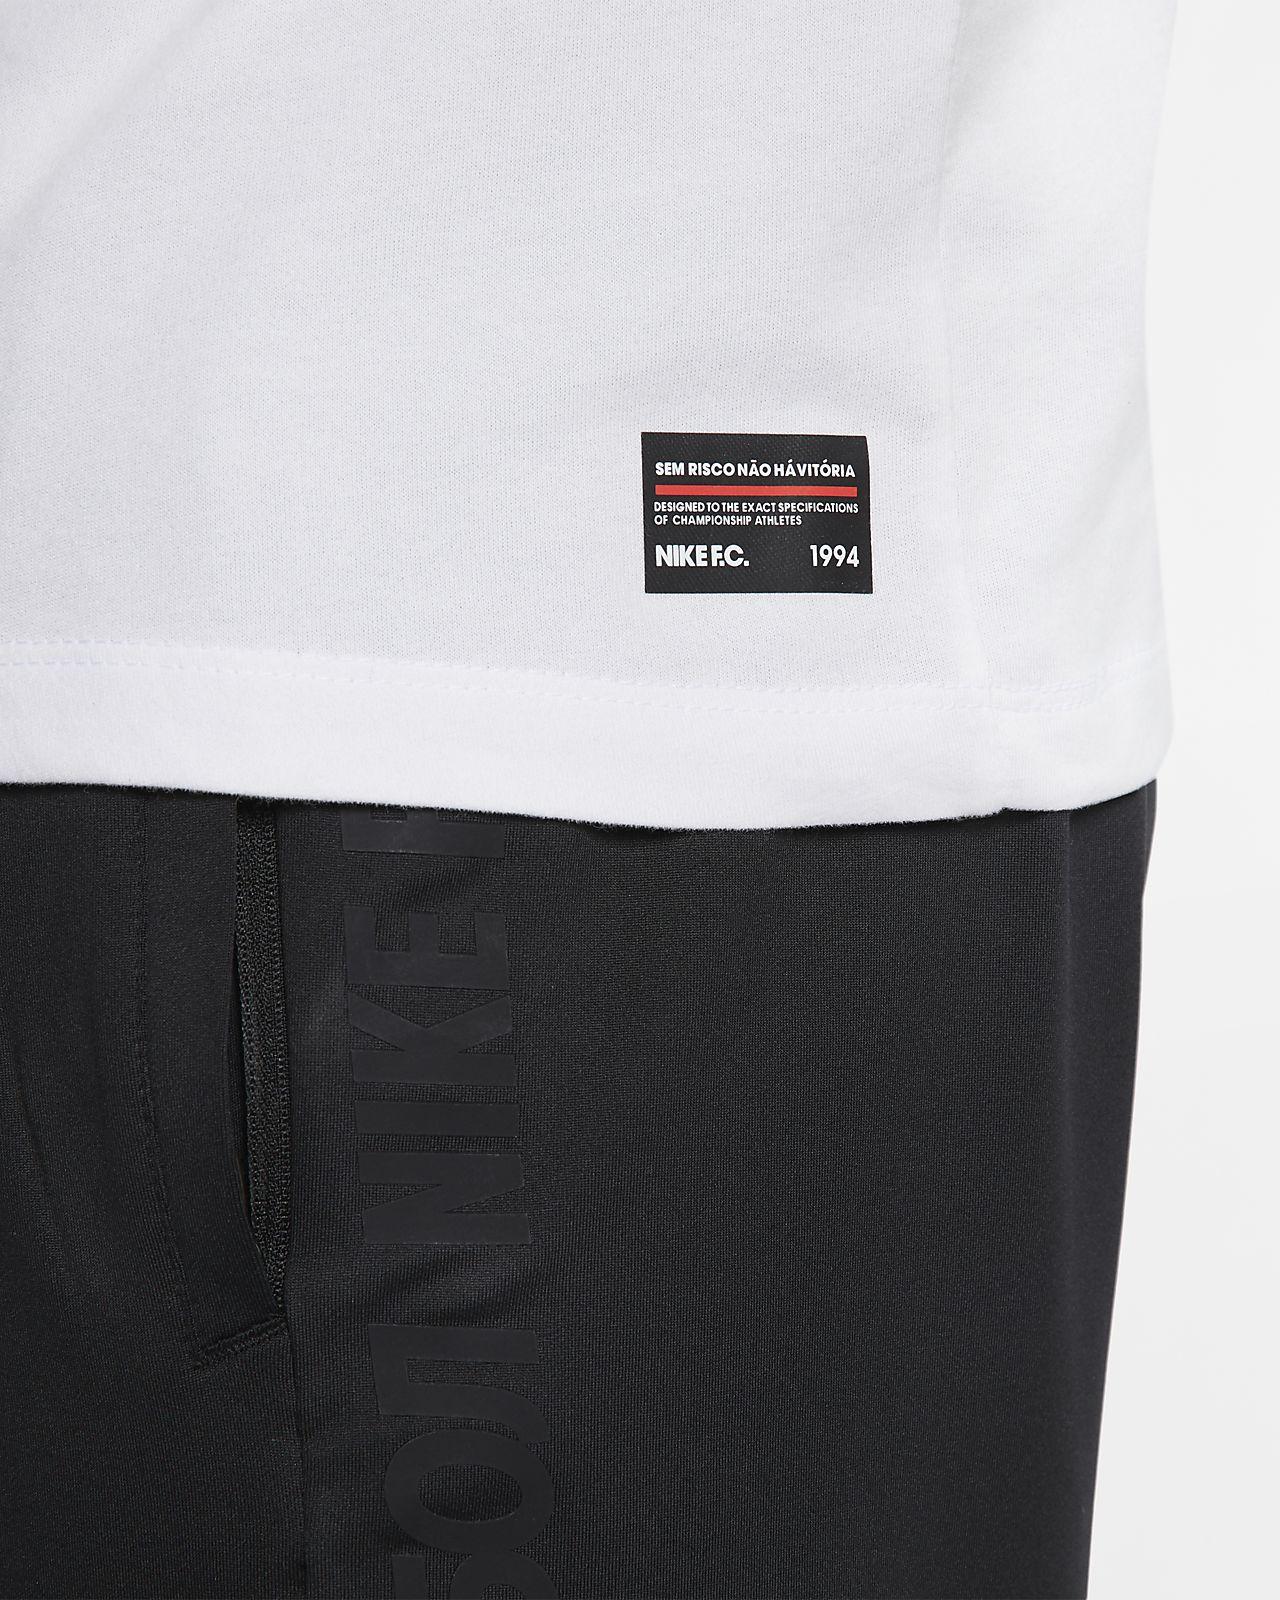 Nike F.C. Dri FIT fodbold T shirt til mænd